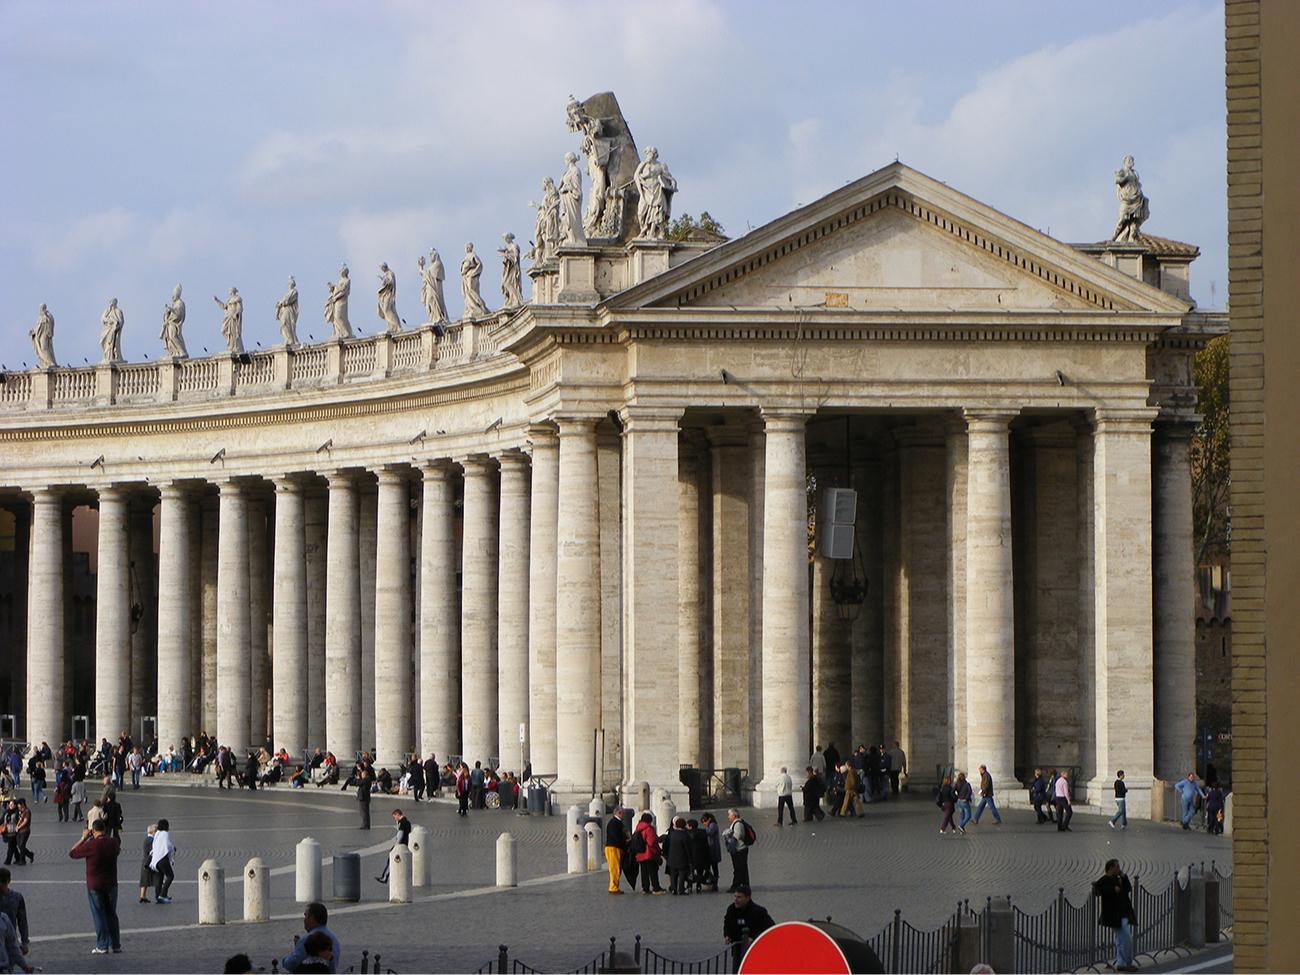 Архитектура классицизма стремилась к симметрии и пропорциям